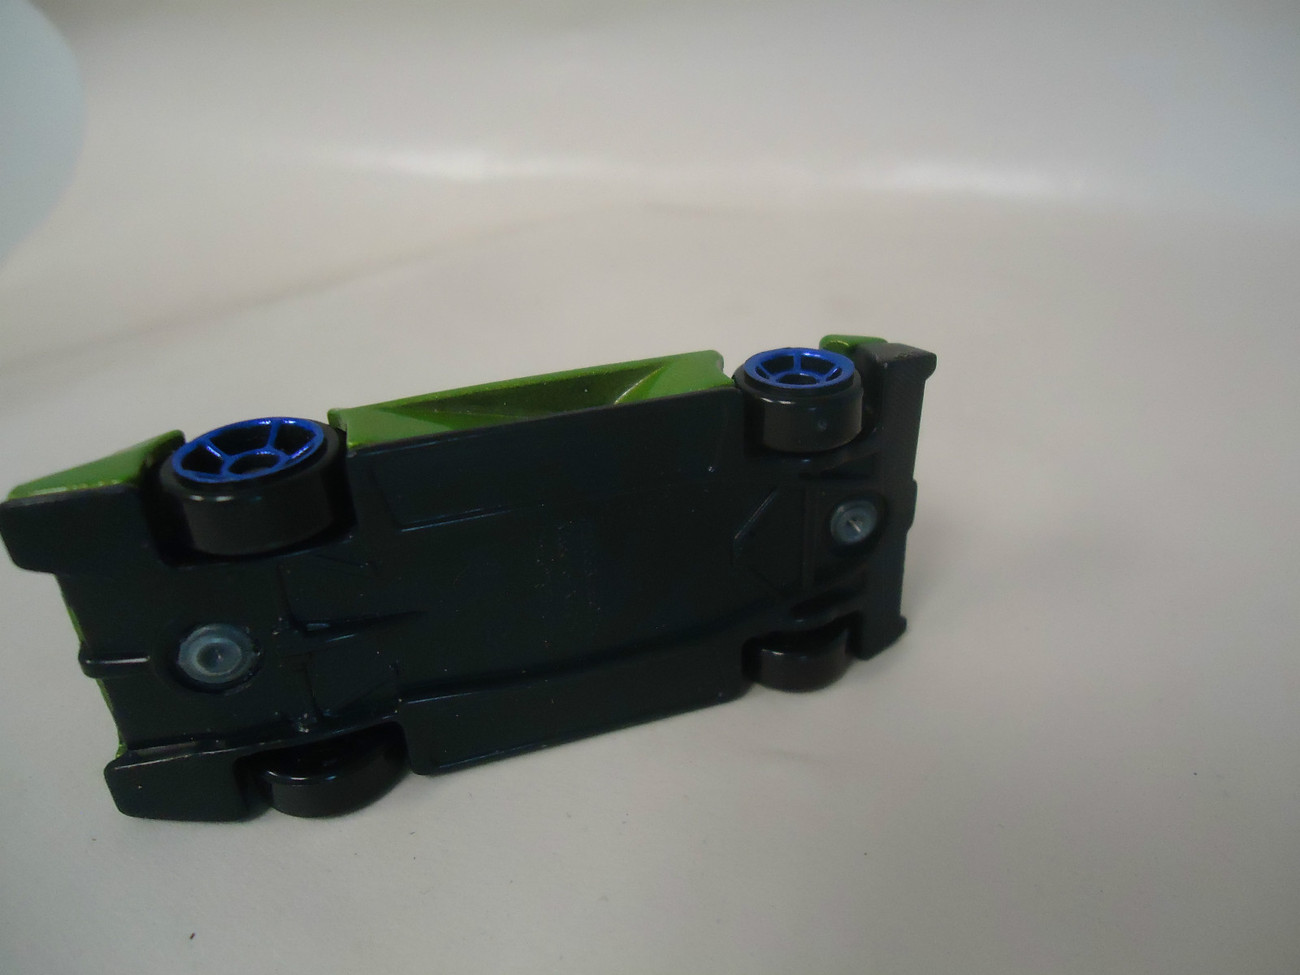 2006 Mattel for MCDONALDS  SPEED CAR